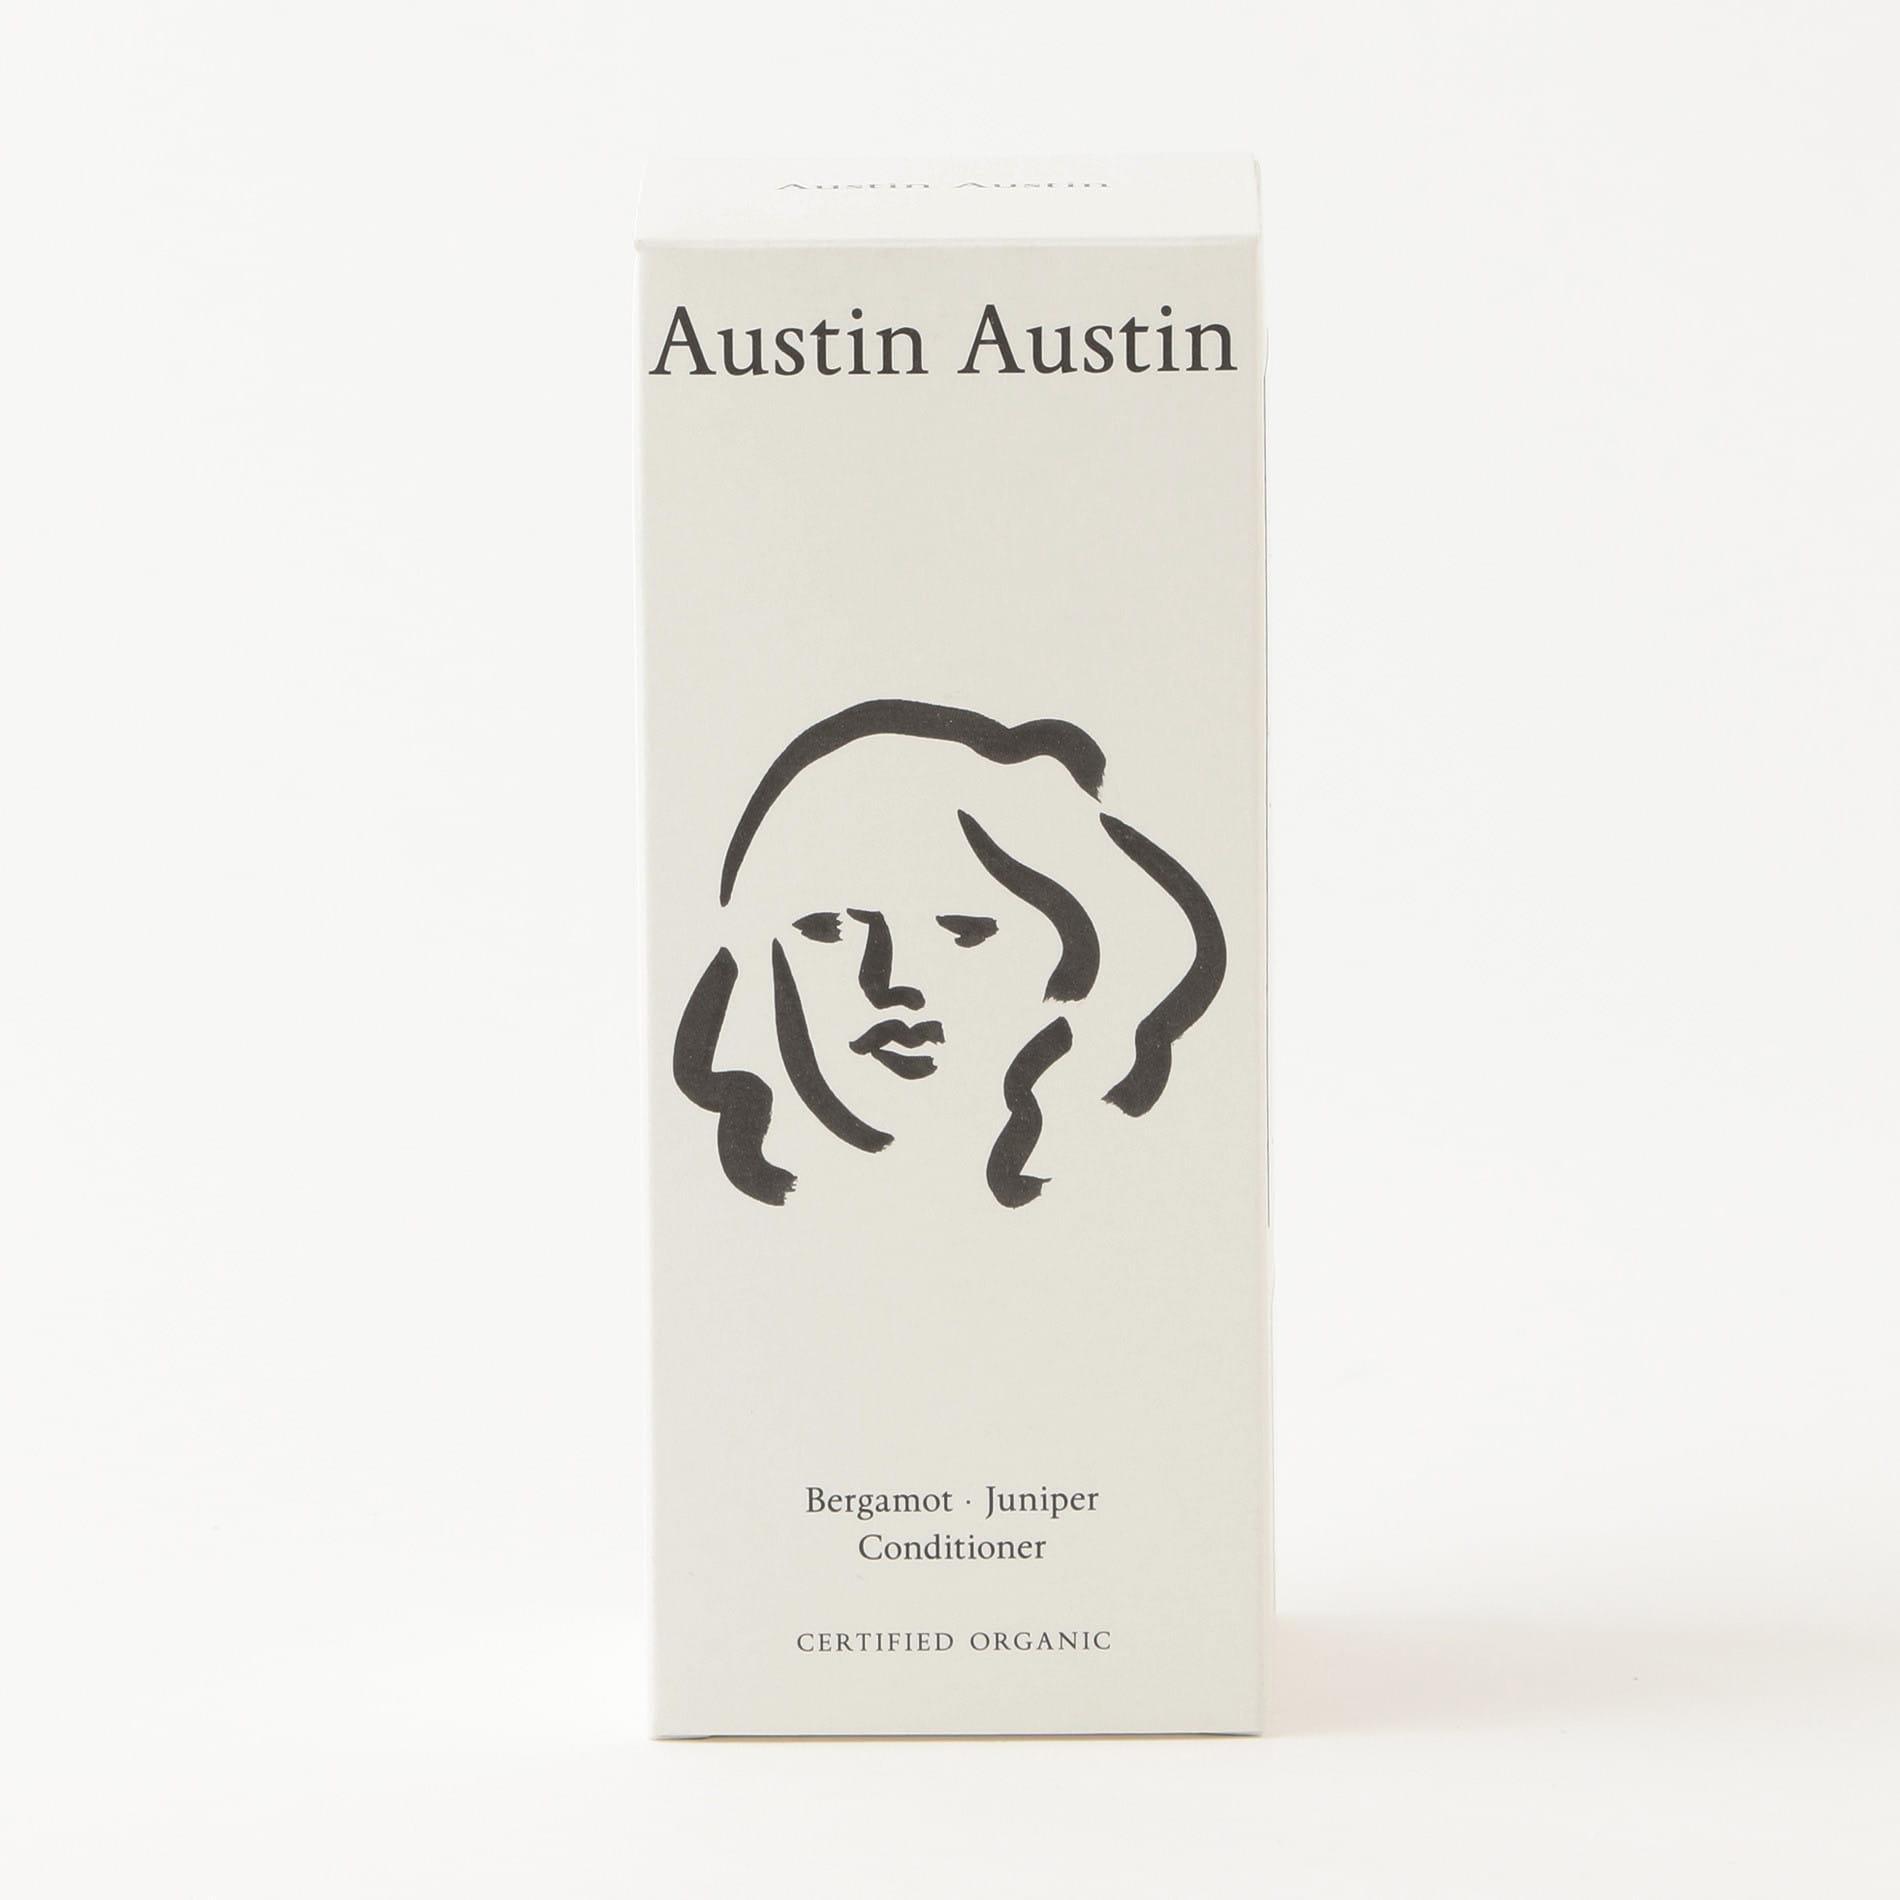 【Austin Austin】コンディショナー MB03018A